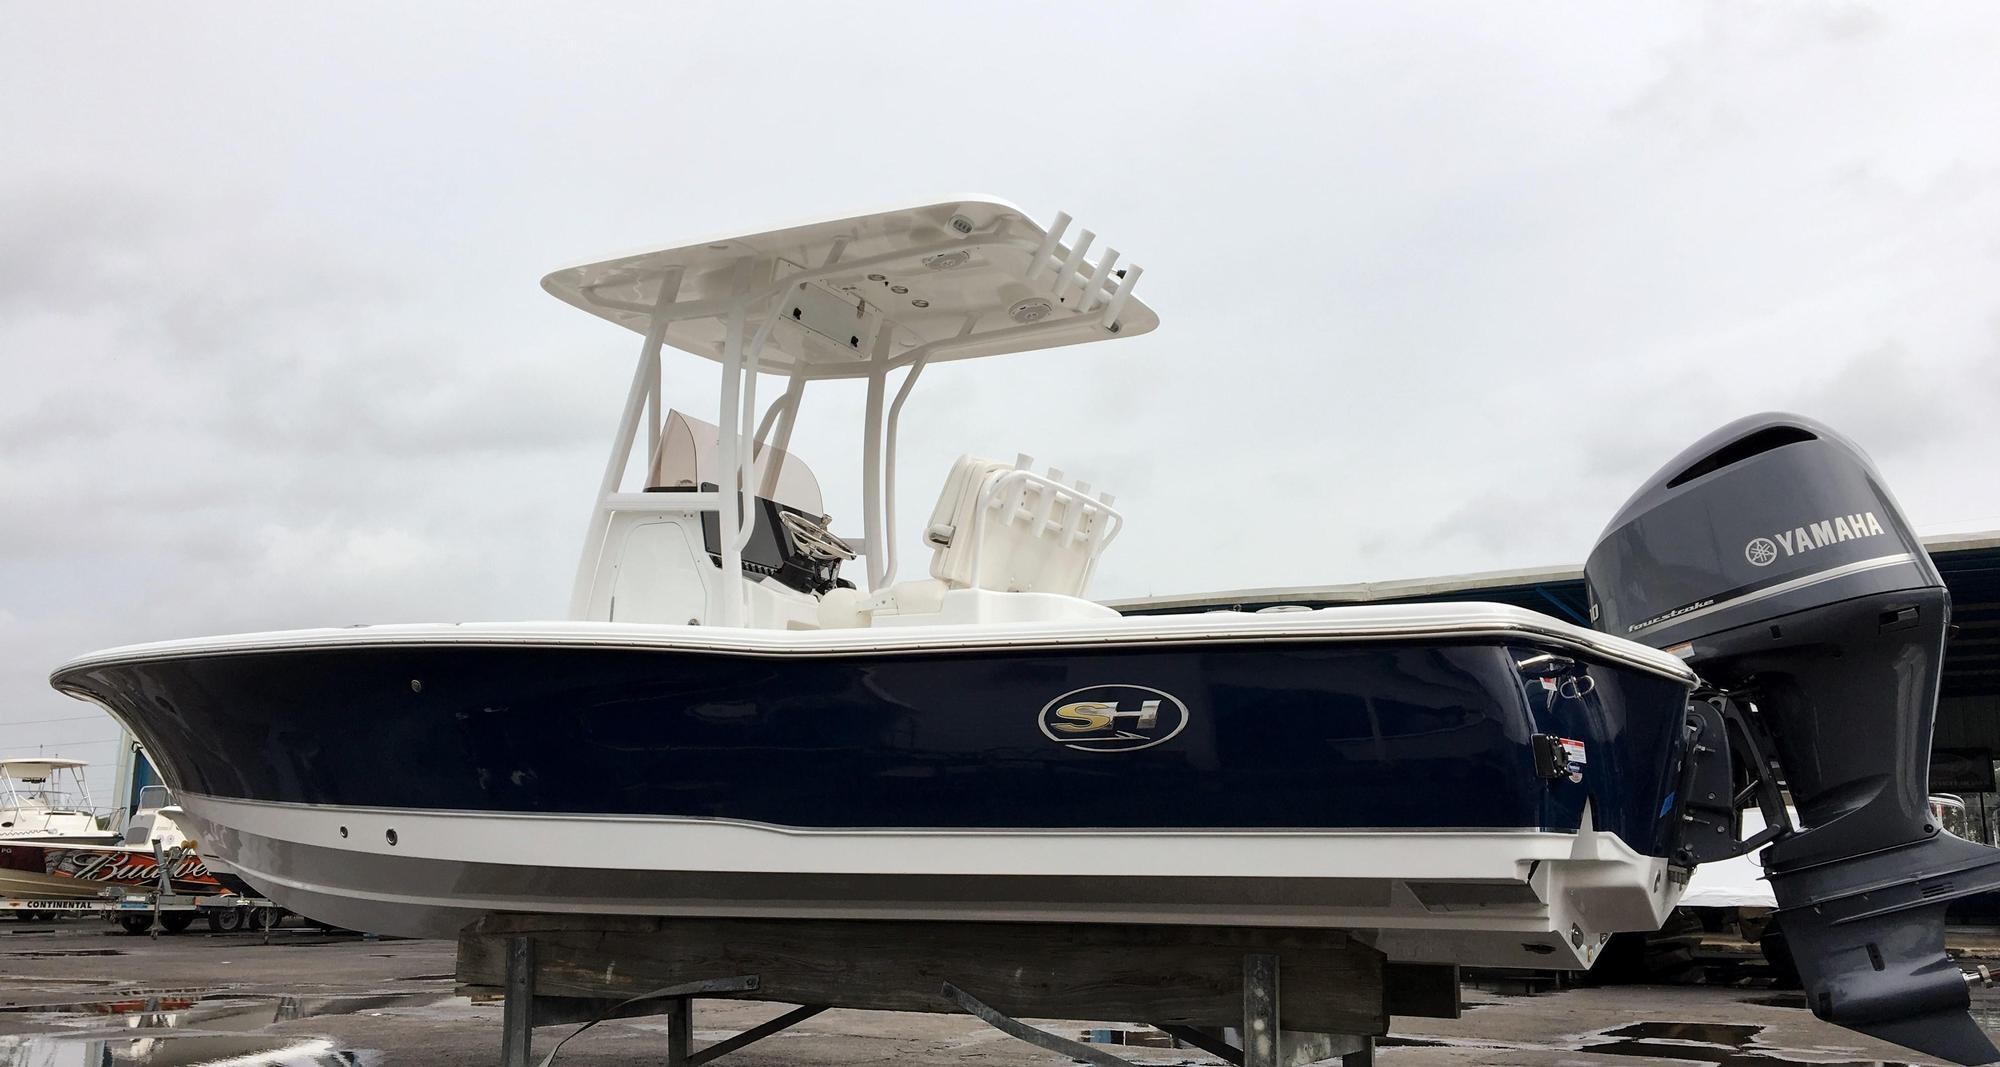 2018 sea hunt bay boat bx 25 br ingman marine for Yamaha repower cost